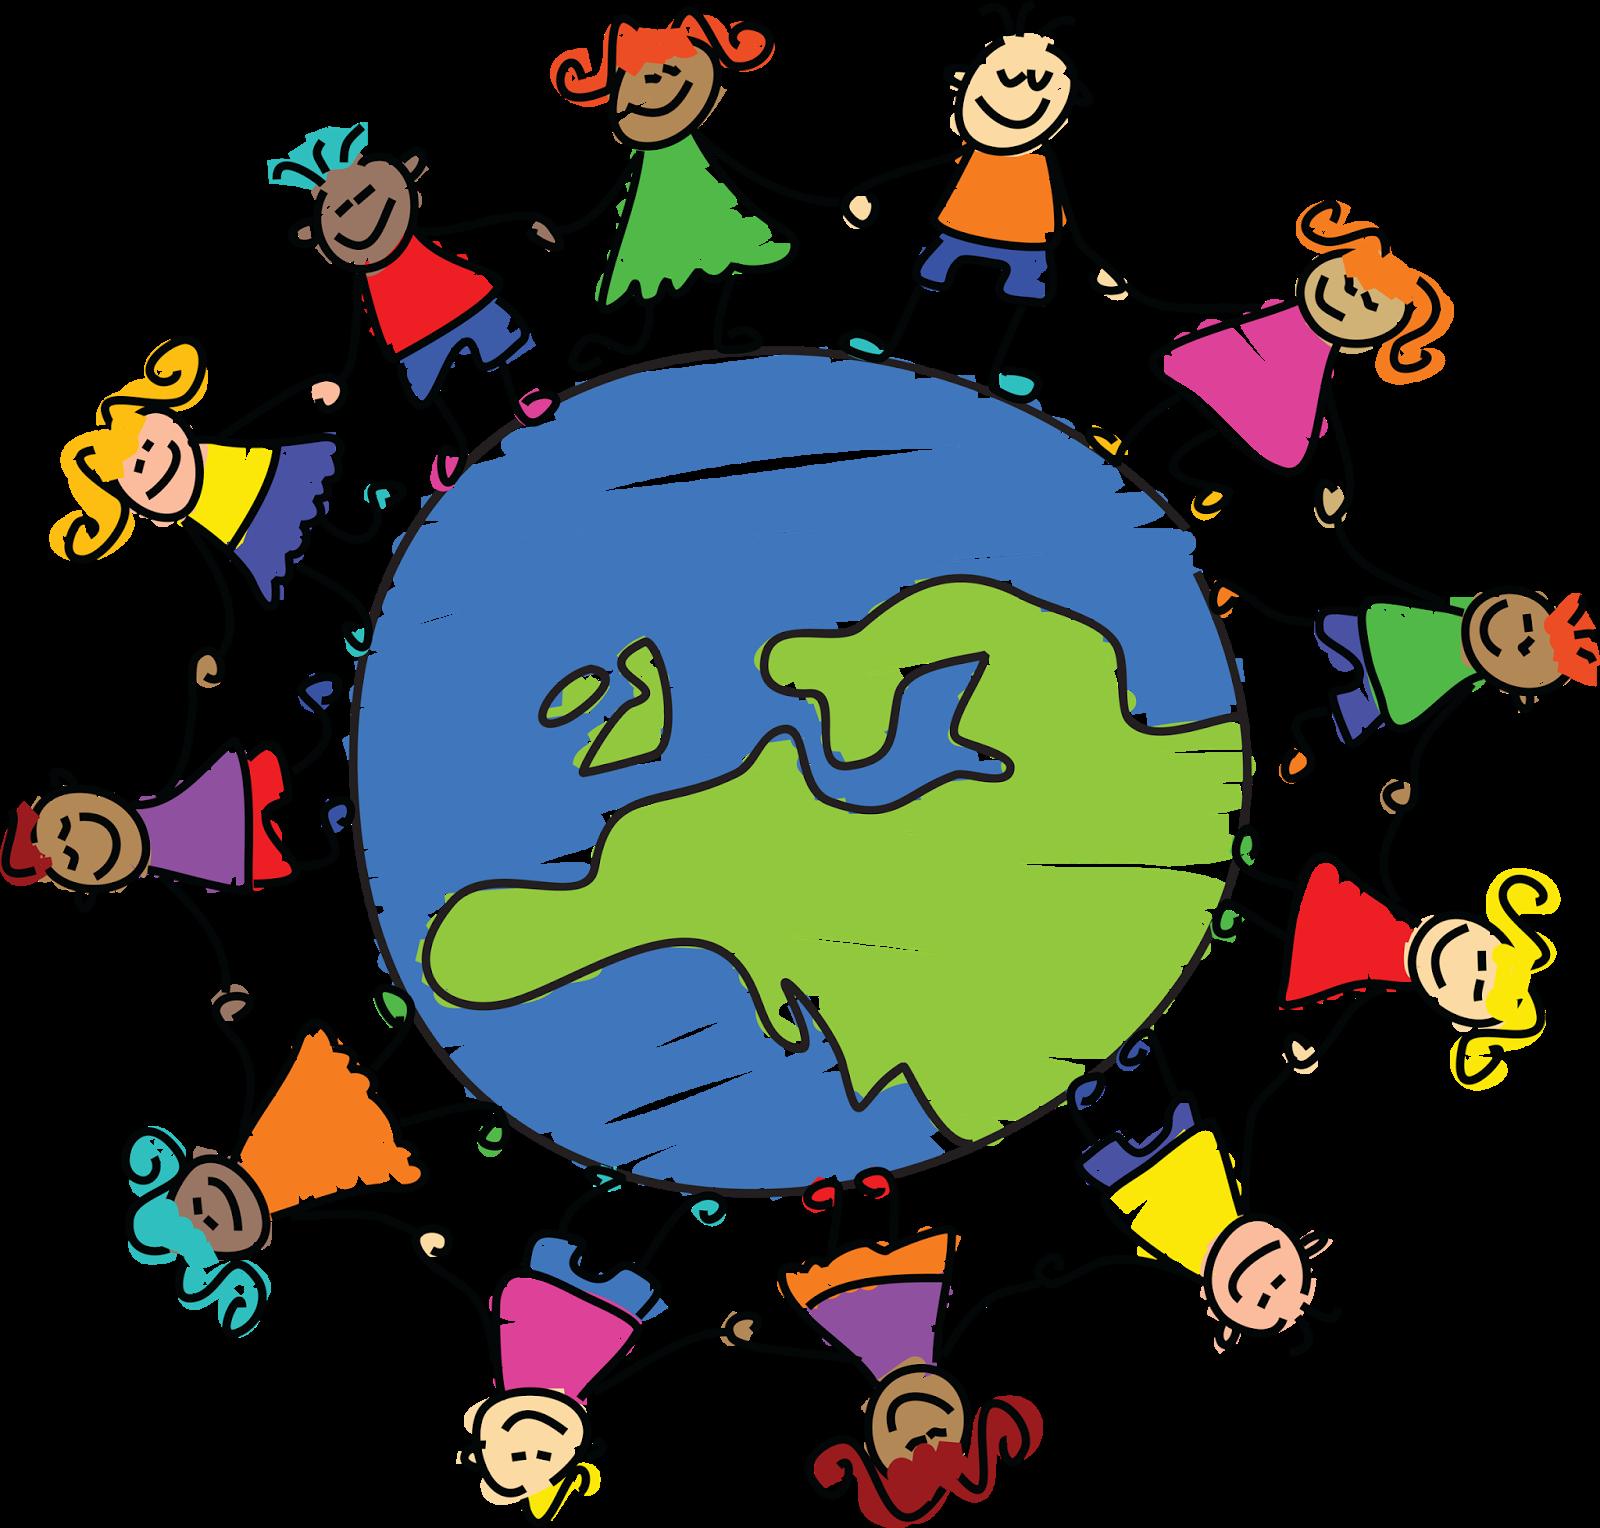 Blogs around the walking. Friendship clipart world unity